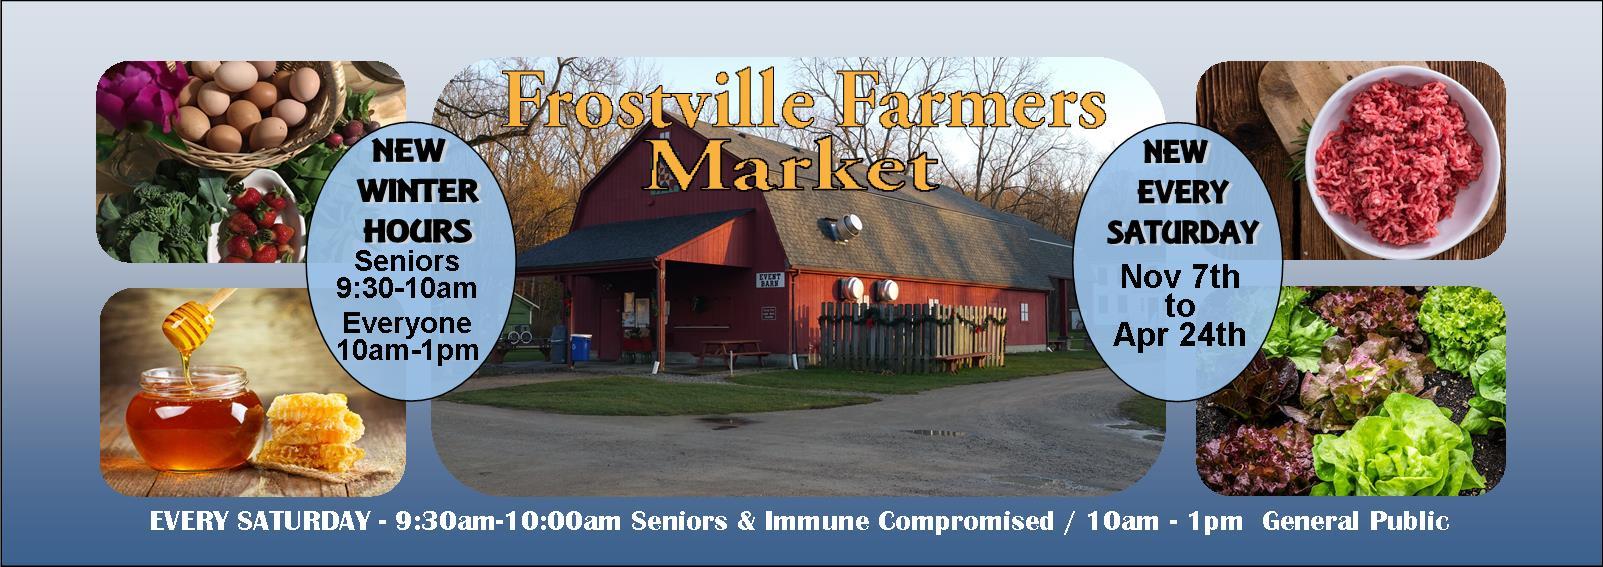 Frostville Farmers Market banner plus hours